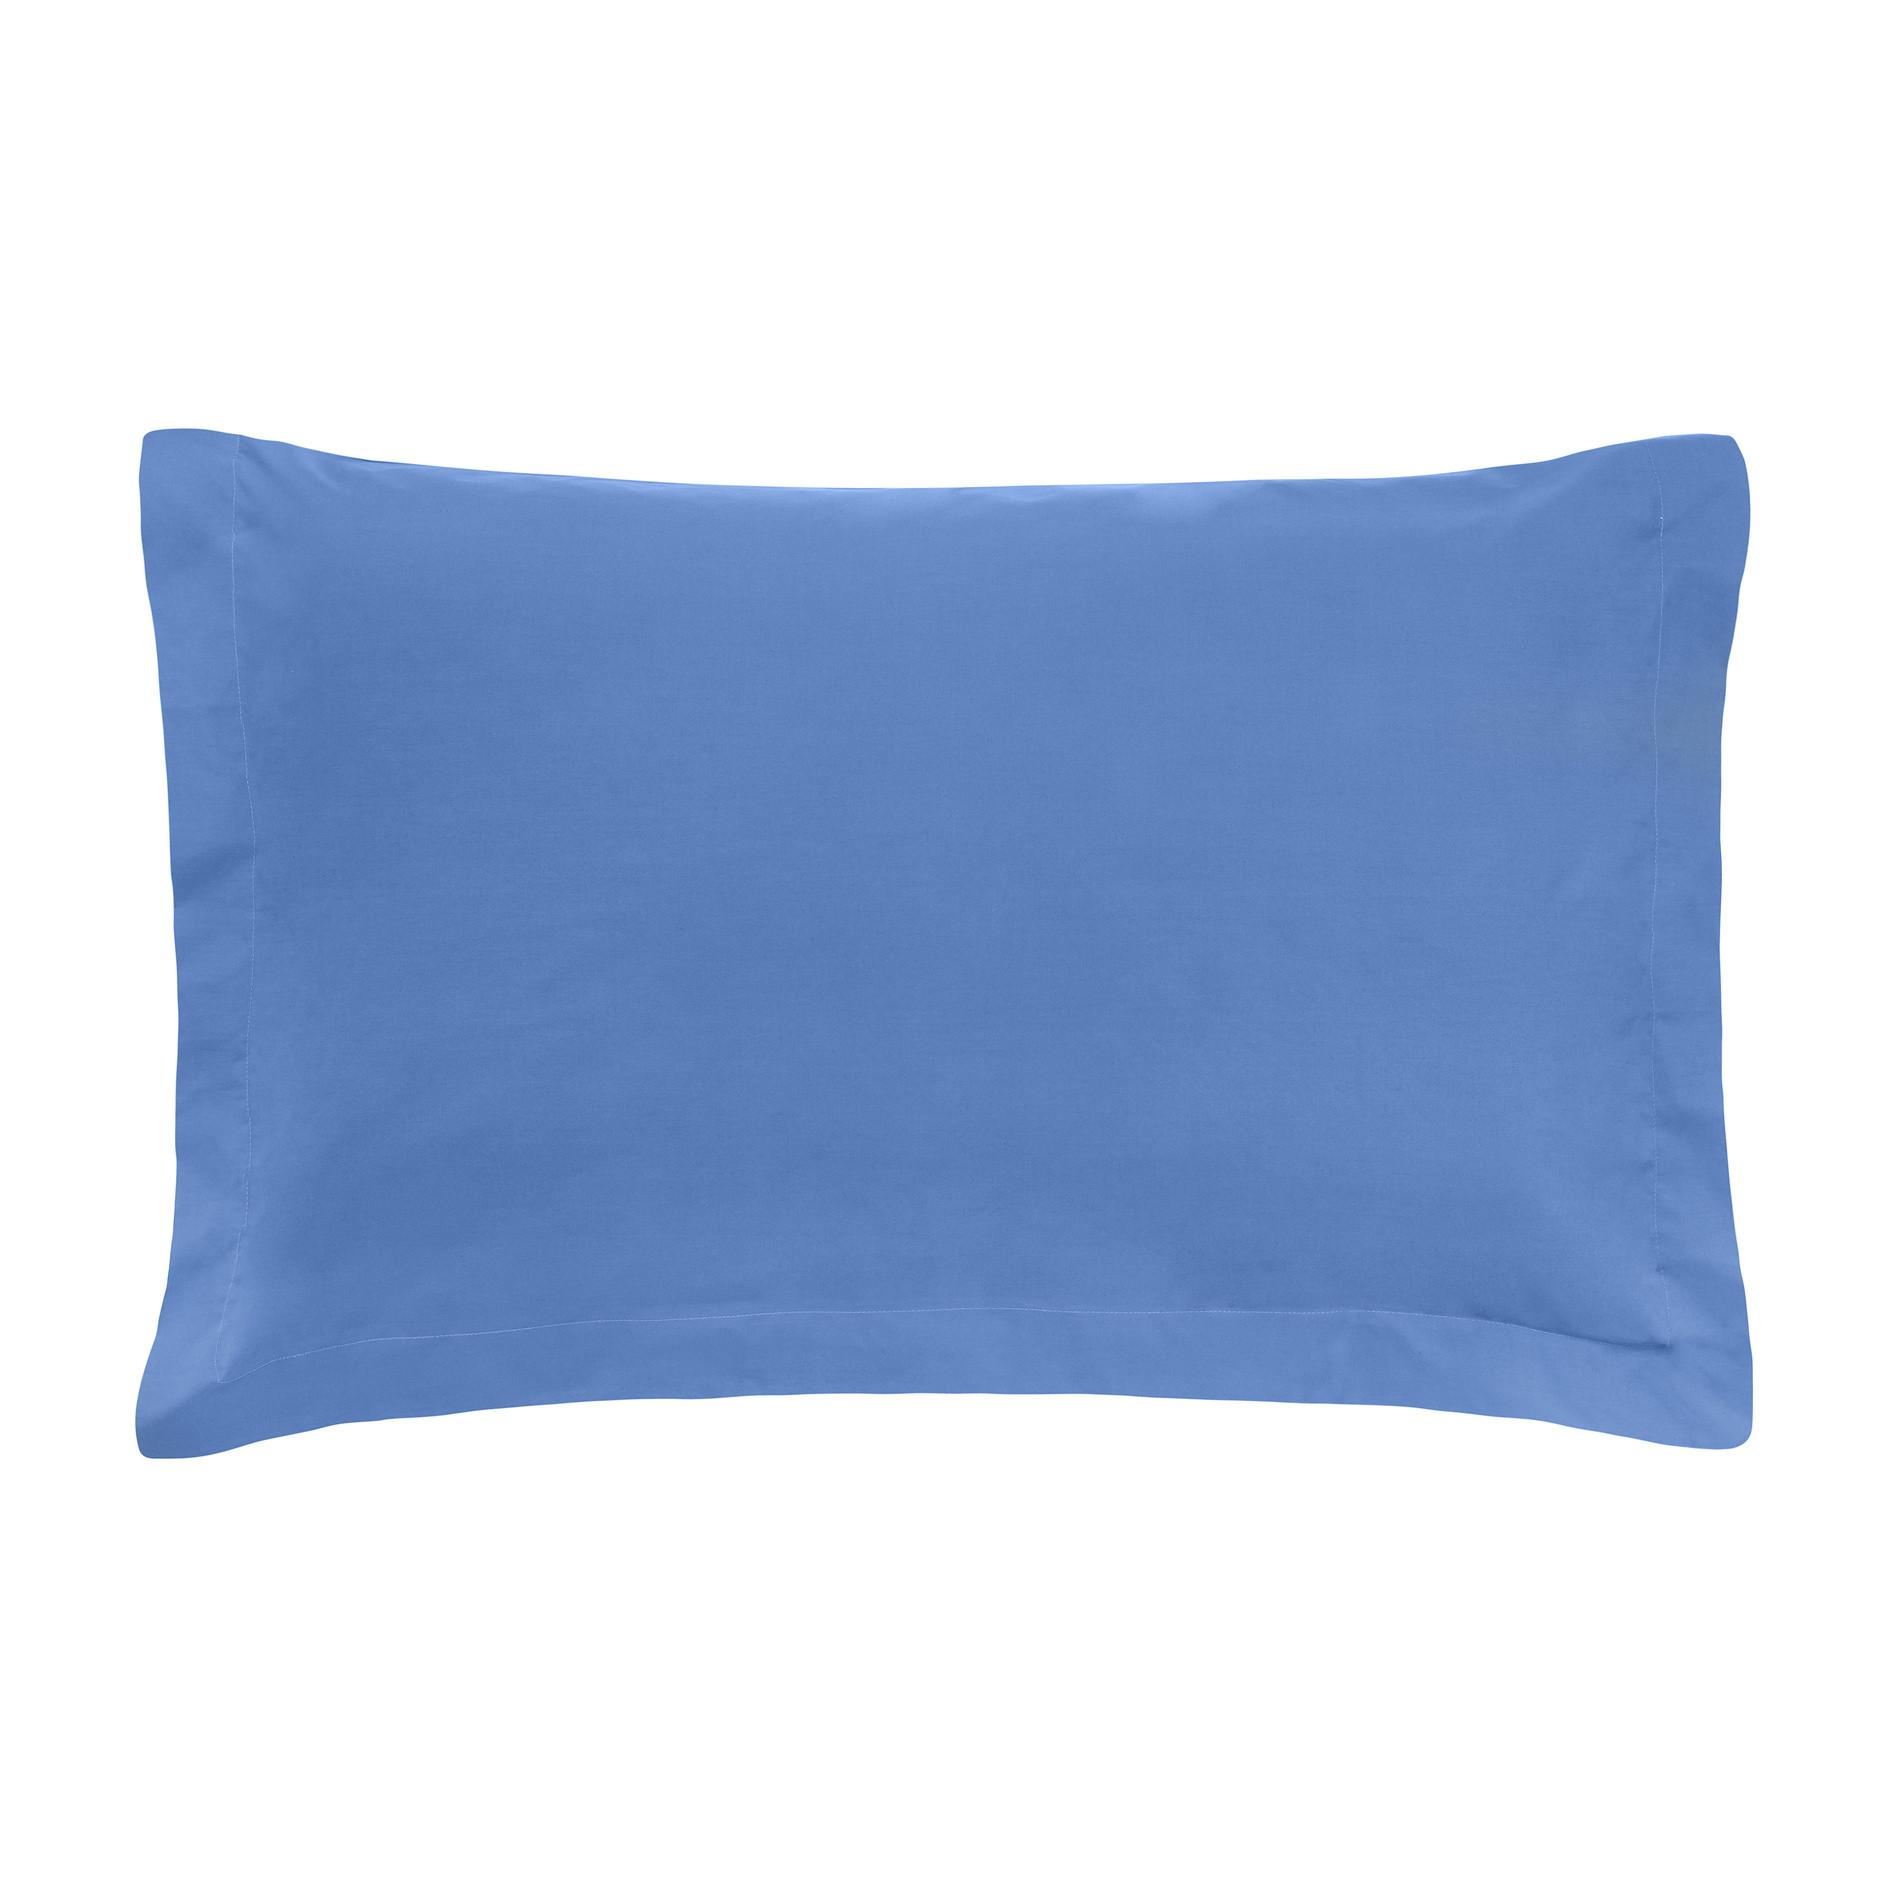 Federa in percalle tinta unita Zefiro, Azzurro celeste, large image number 0